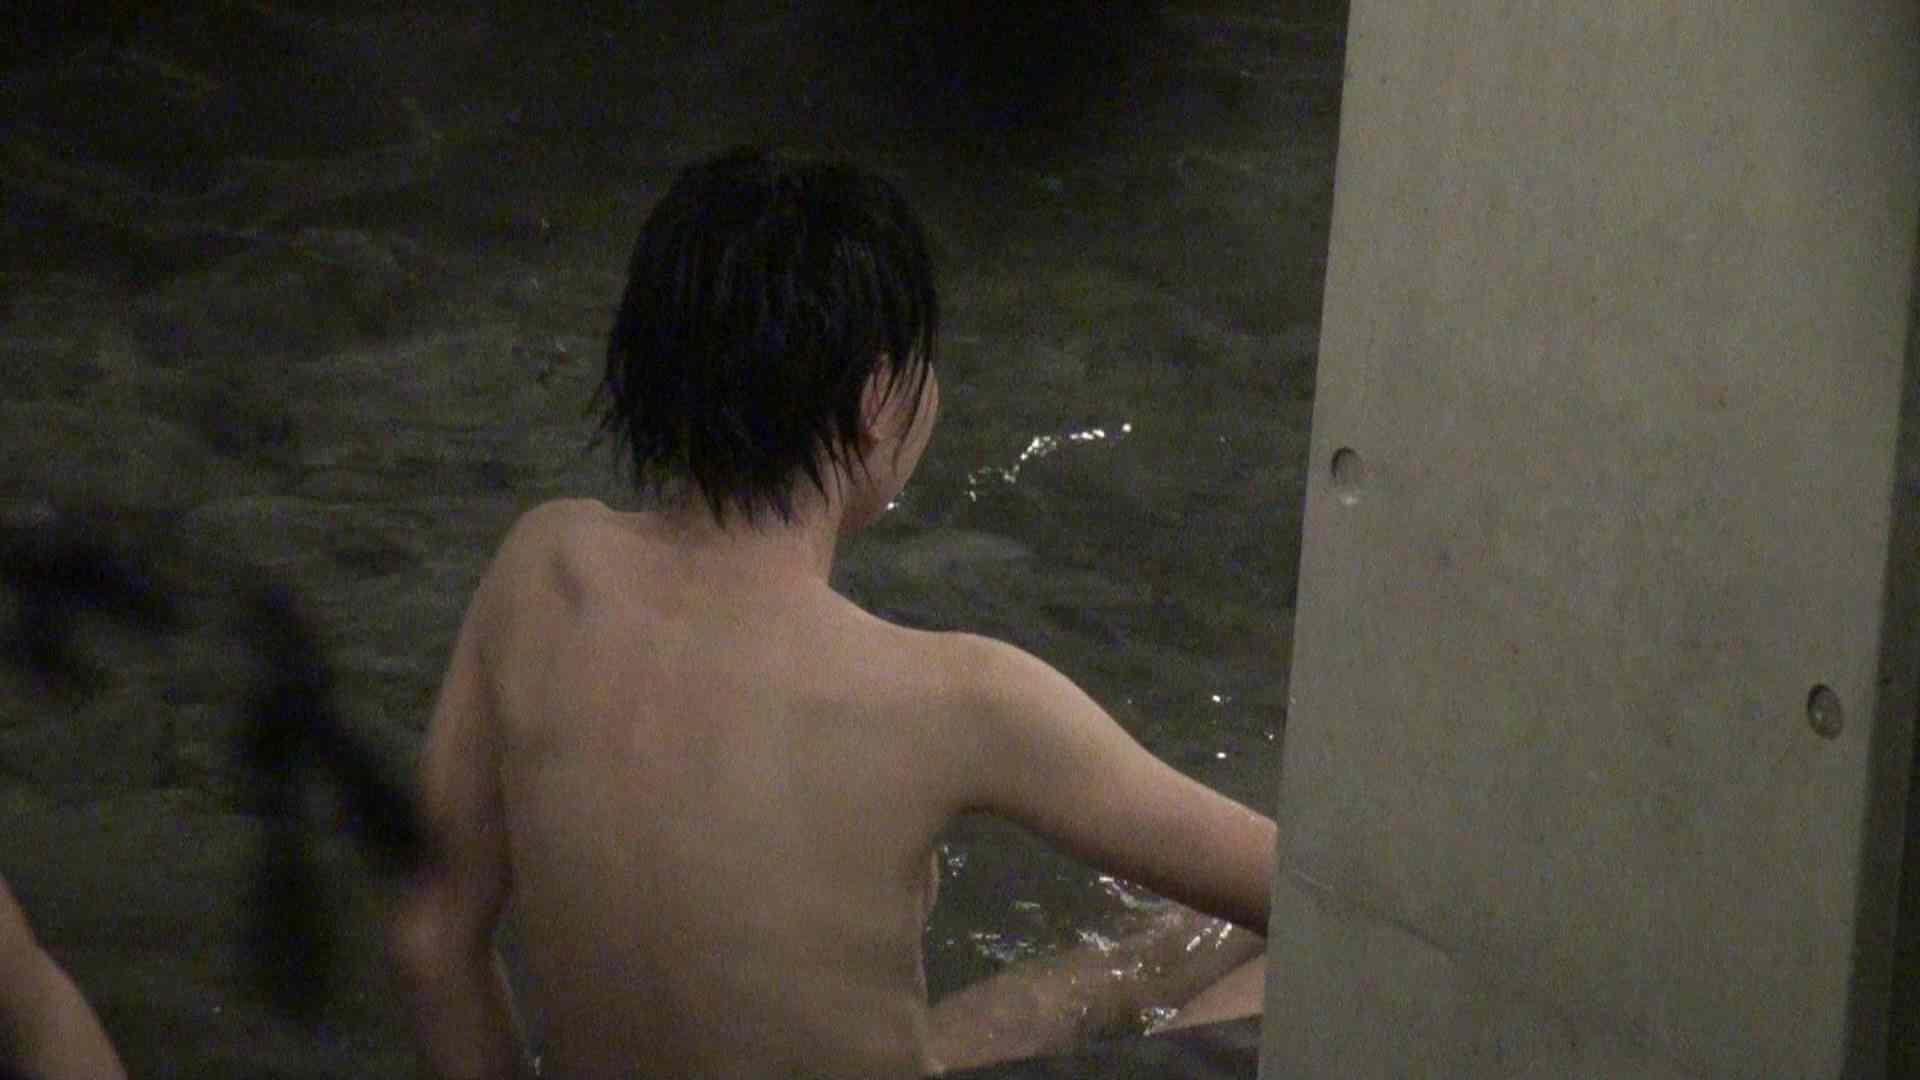 Aquaな露天風呂Vol.323 露天 AV無料動画キャプチャ 69連発 39